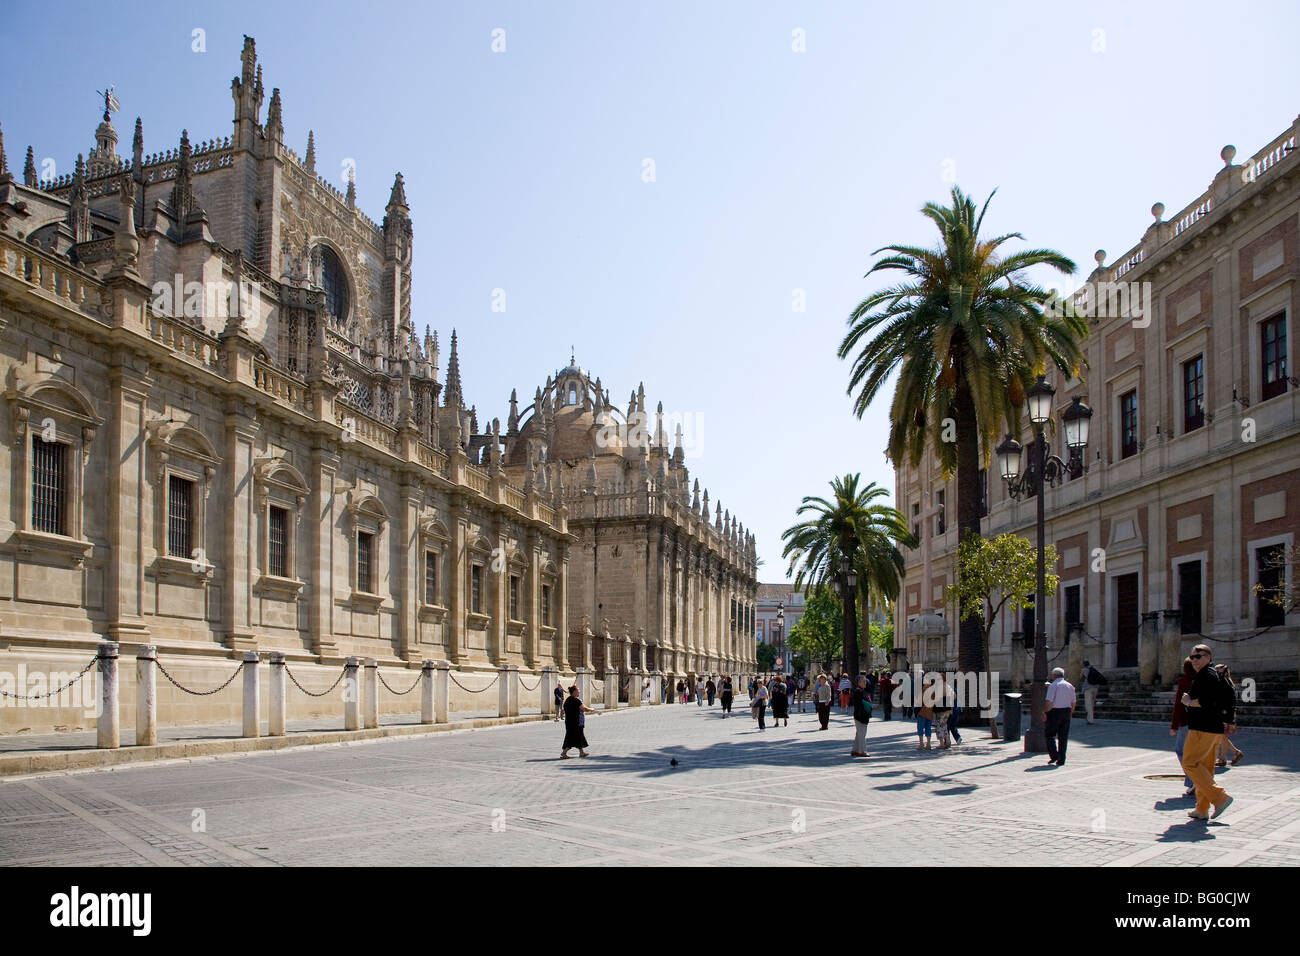 Tourists in front of a cathedral, Seville Cathedral, Seville, Spain, Patrimonio de la Humanidad, Archivo de Indias - Stock Image